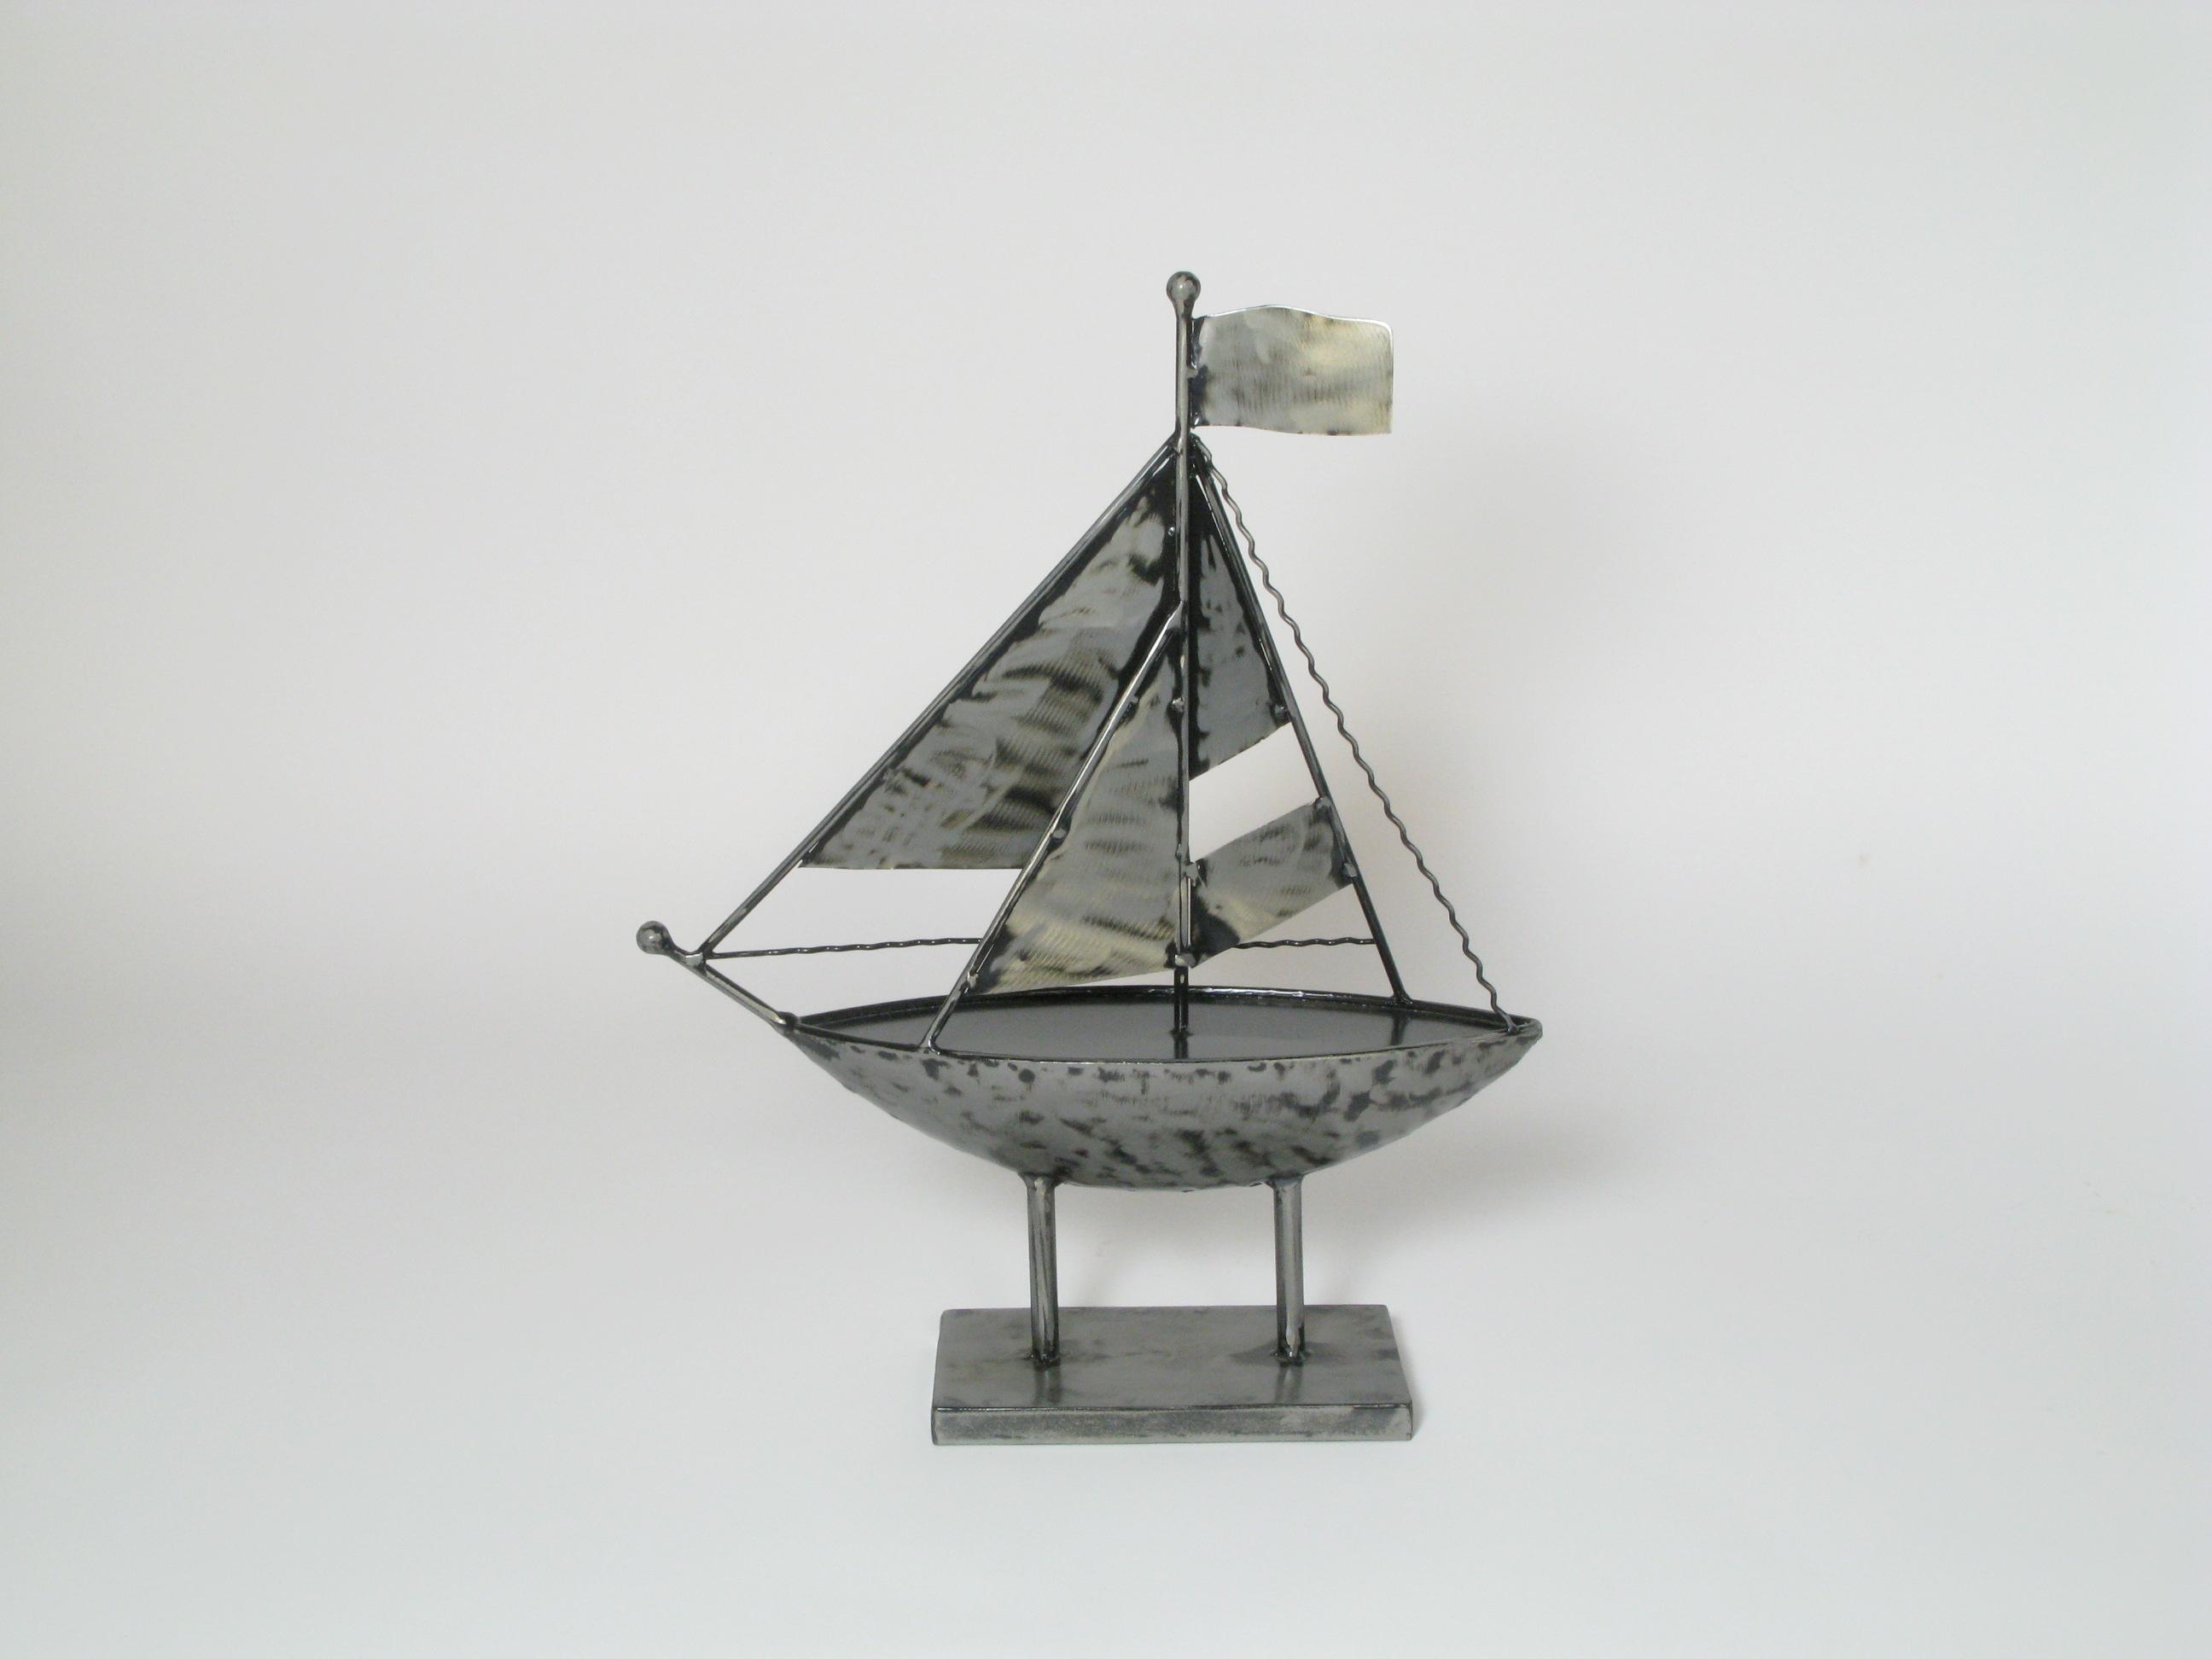 Deko Skulptur Segelboot Auf Fuss Segelschiff Schiff